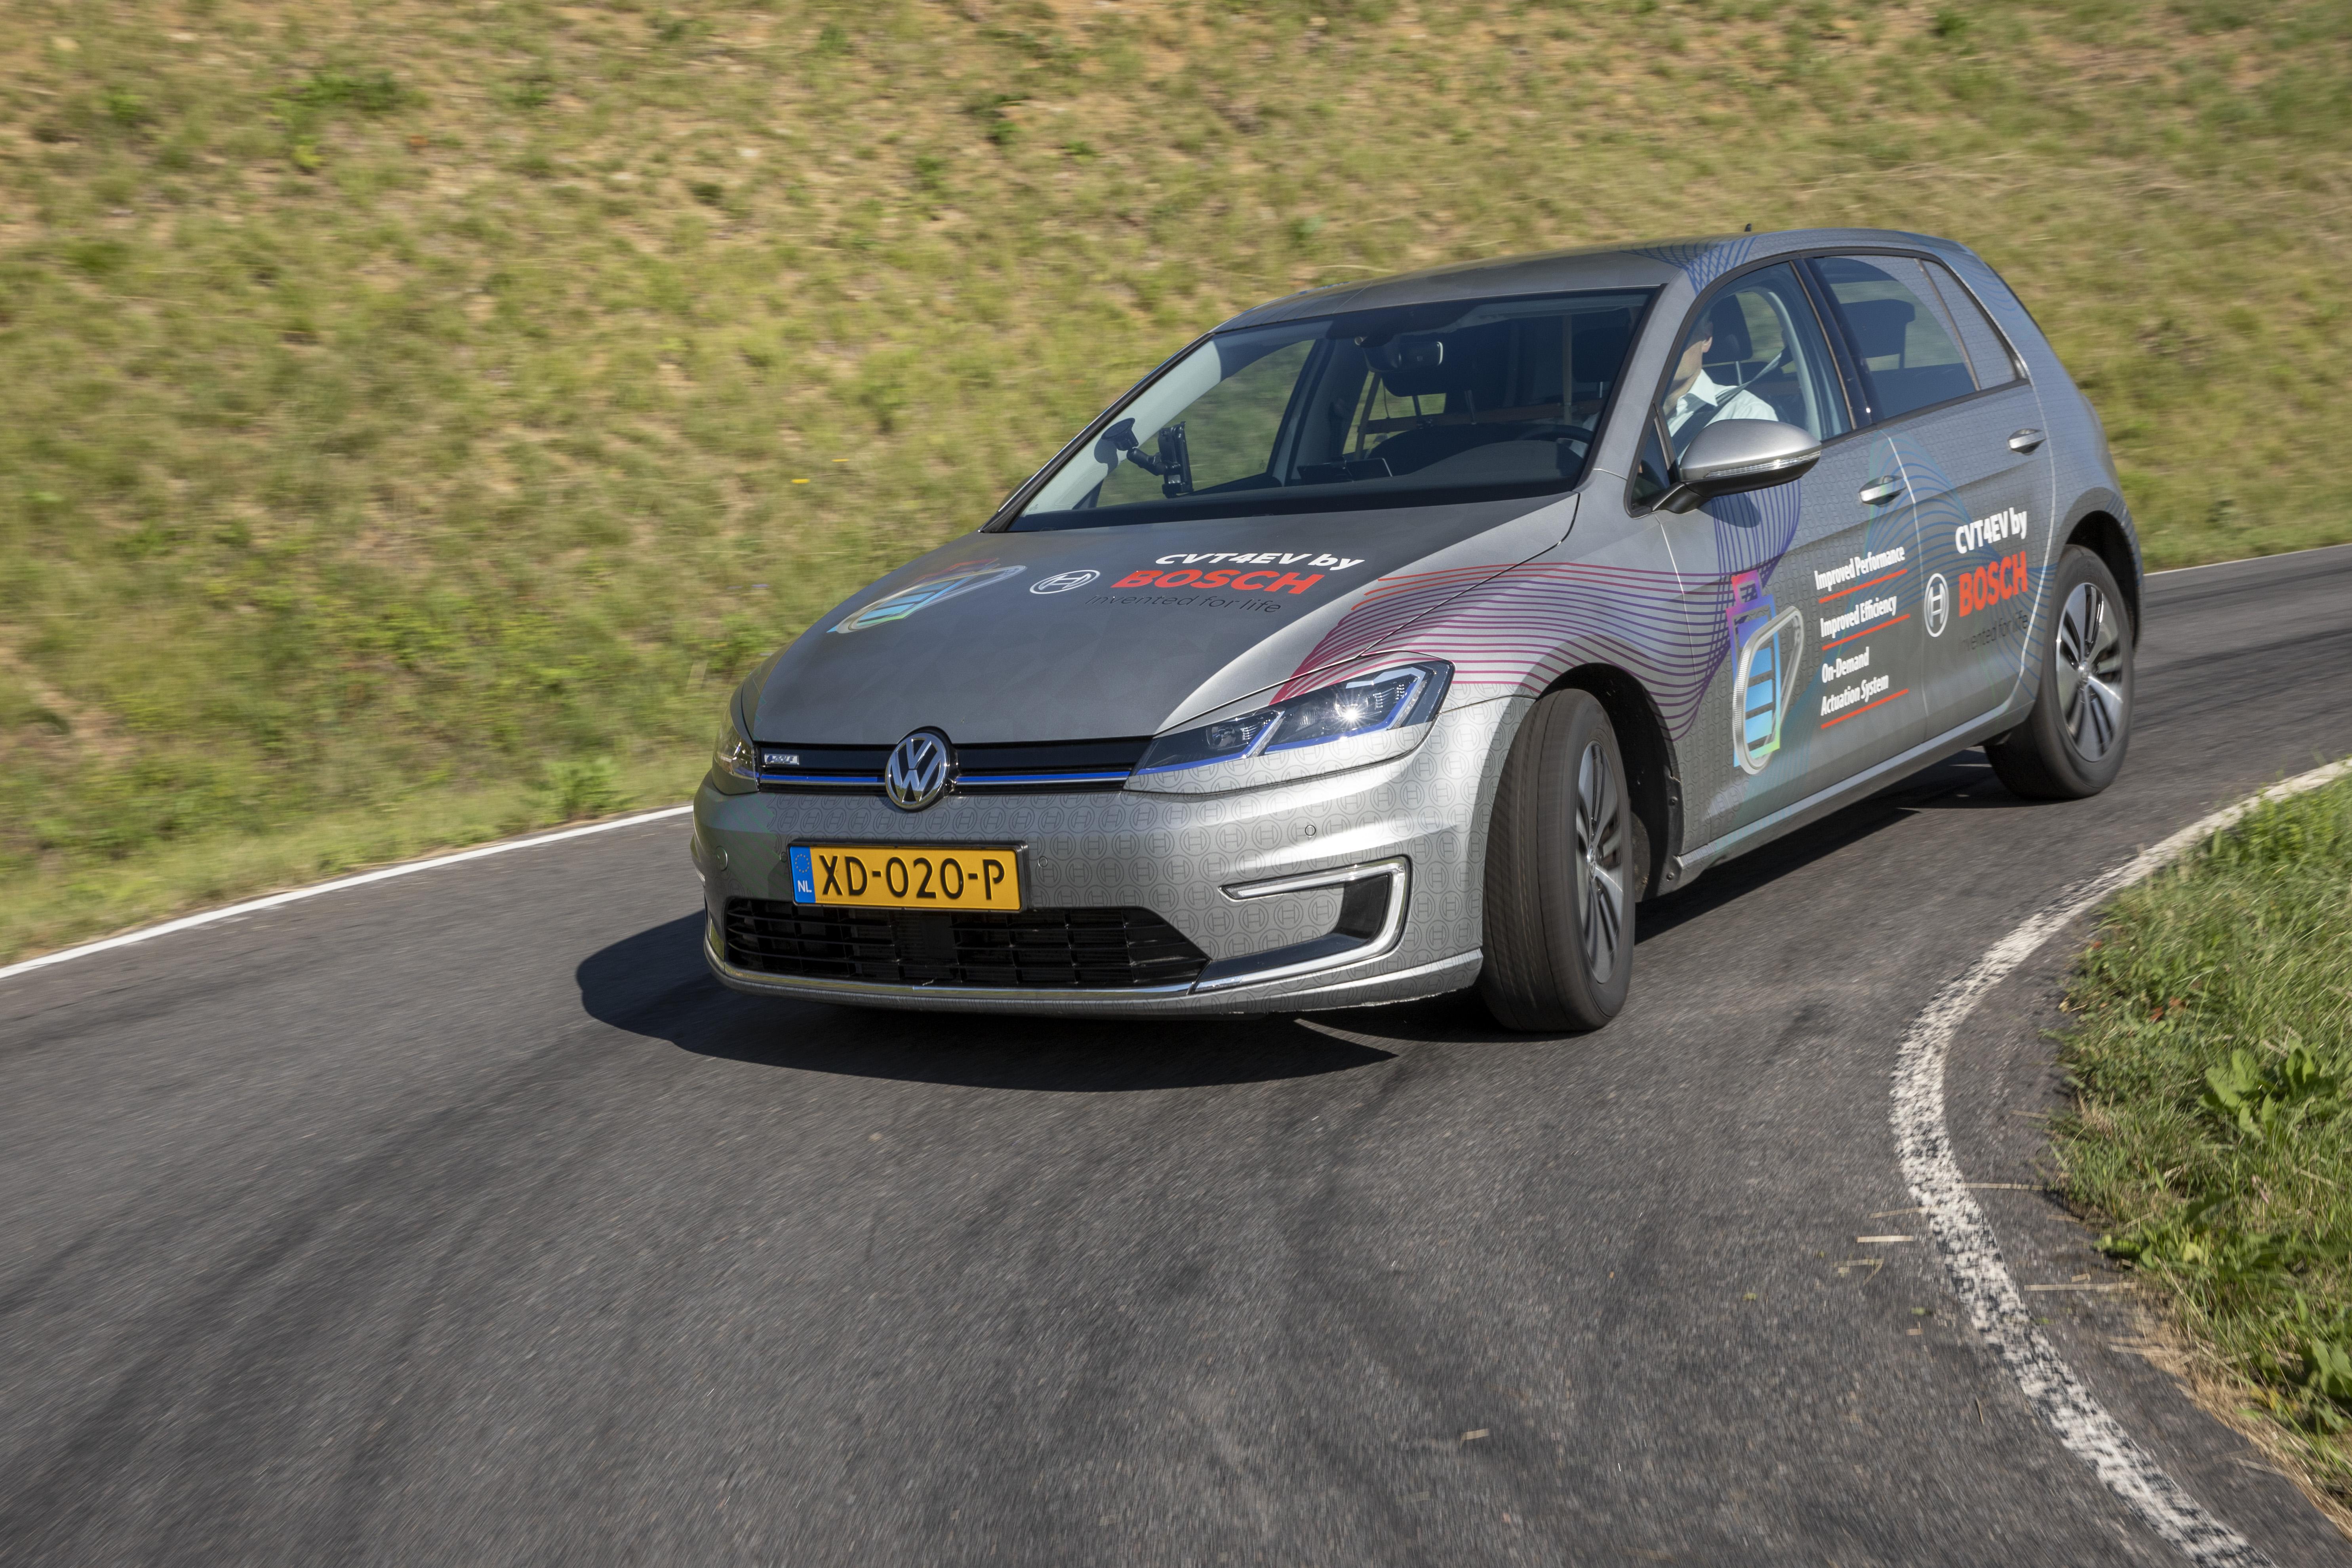 CVT4EV - stufenloses Automatikgetriebe für Elektrofahrzeuge